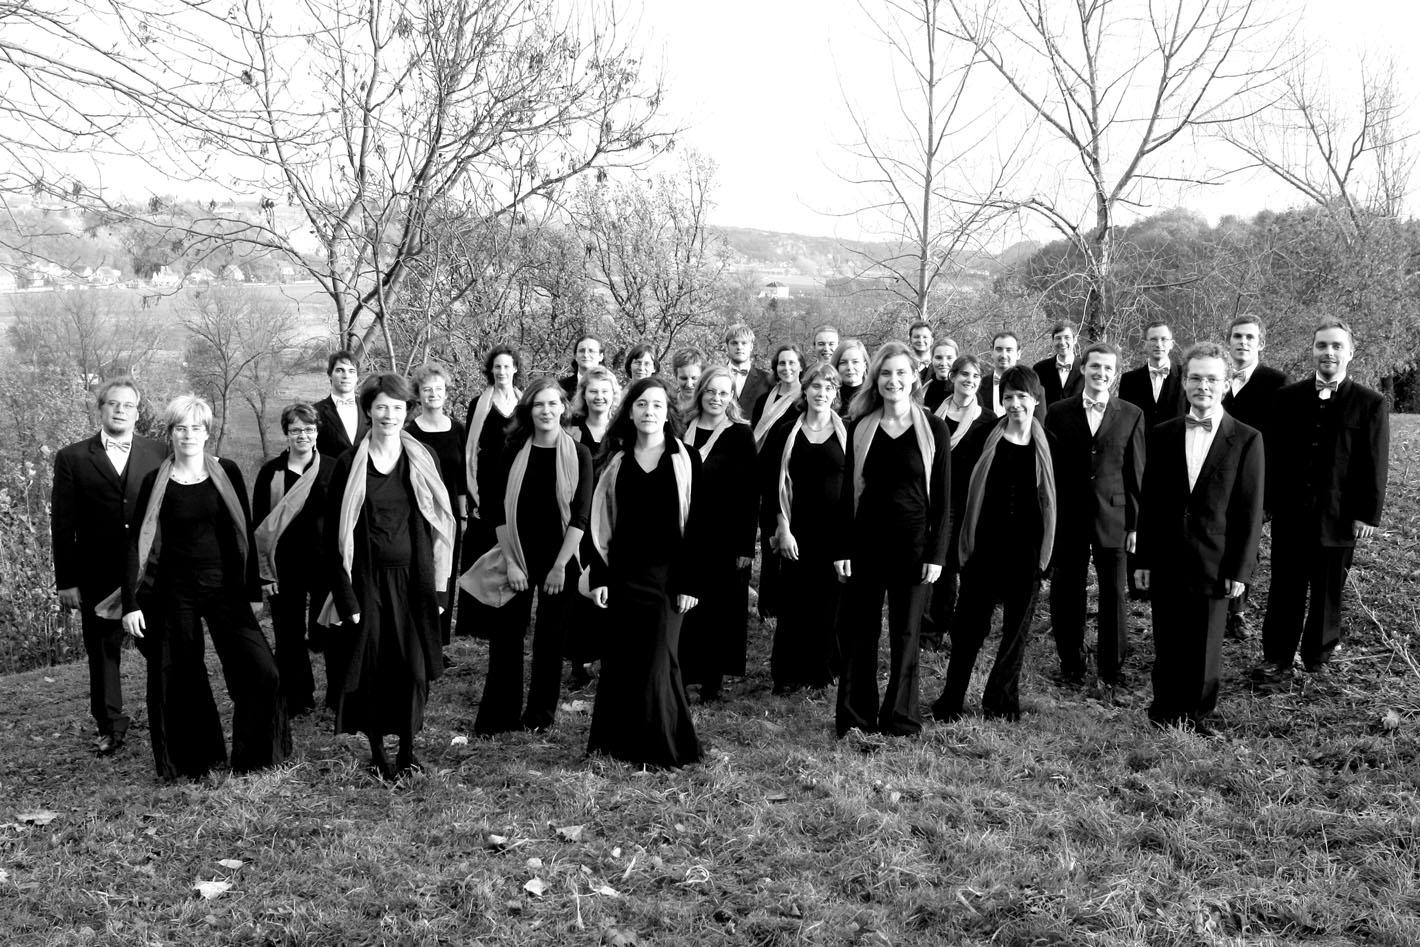 kammerchor cantamus dresden (2010/2011)